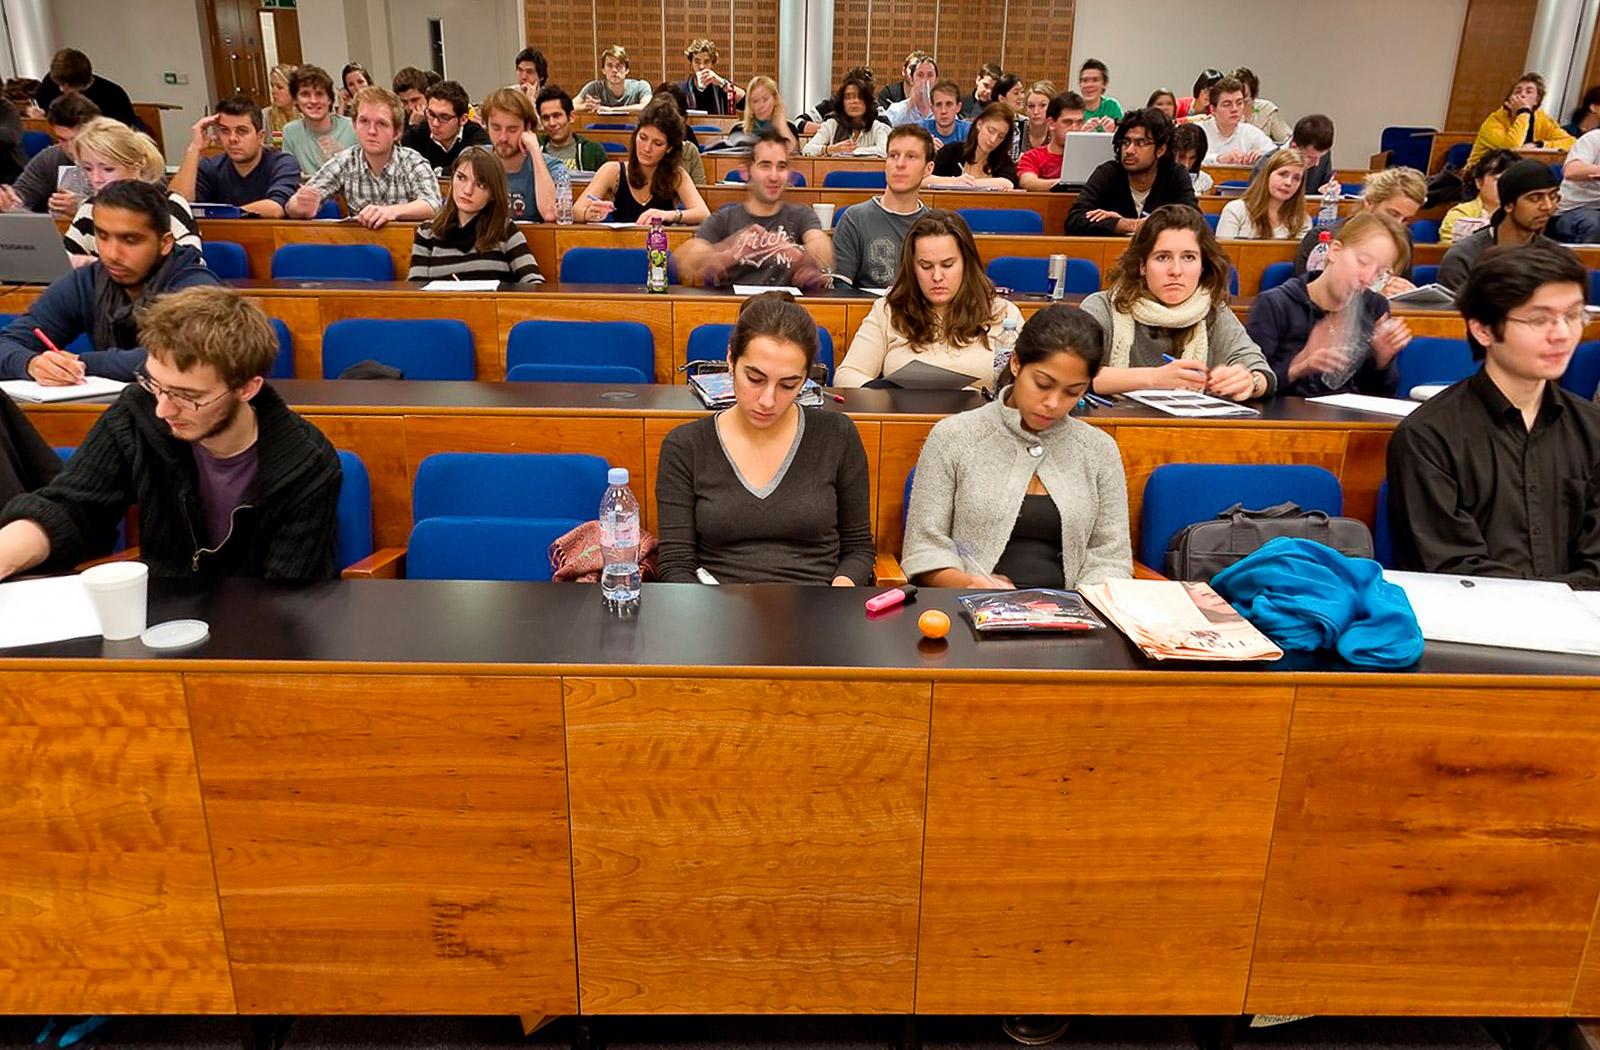 BPP Law School, Waterloo